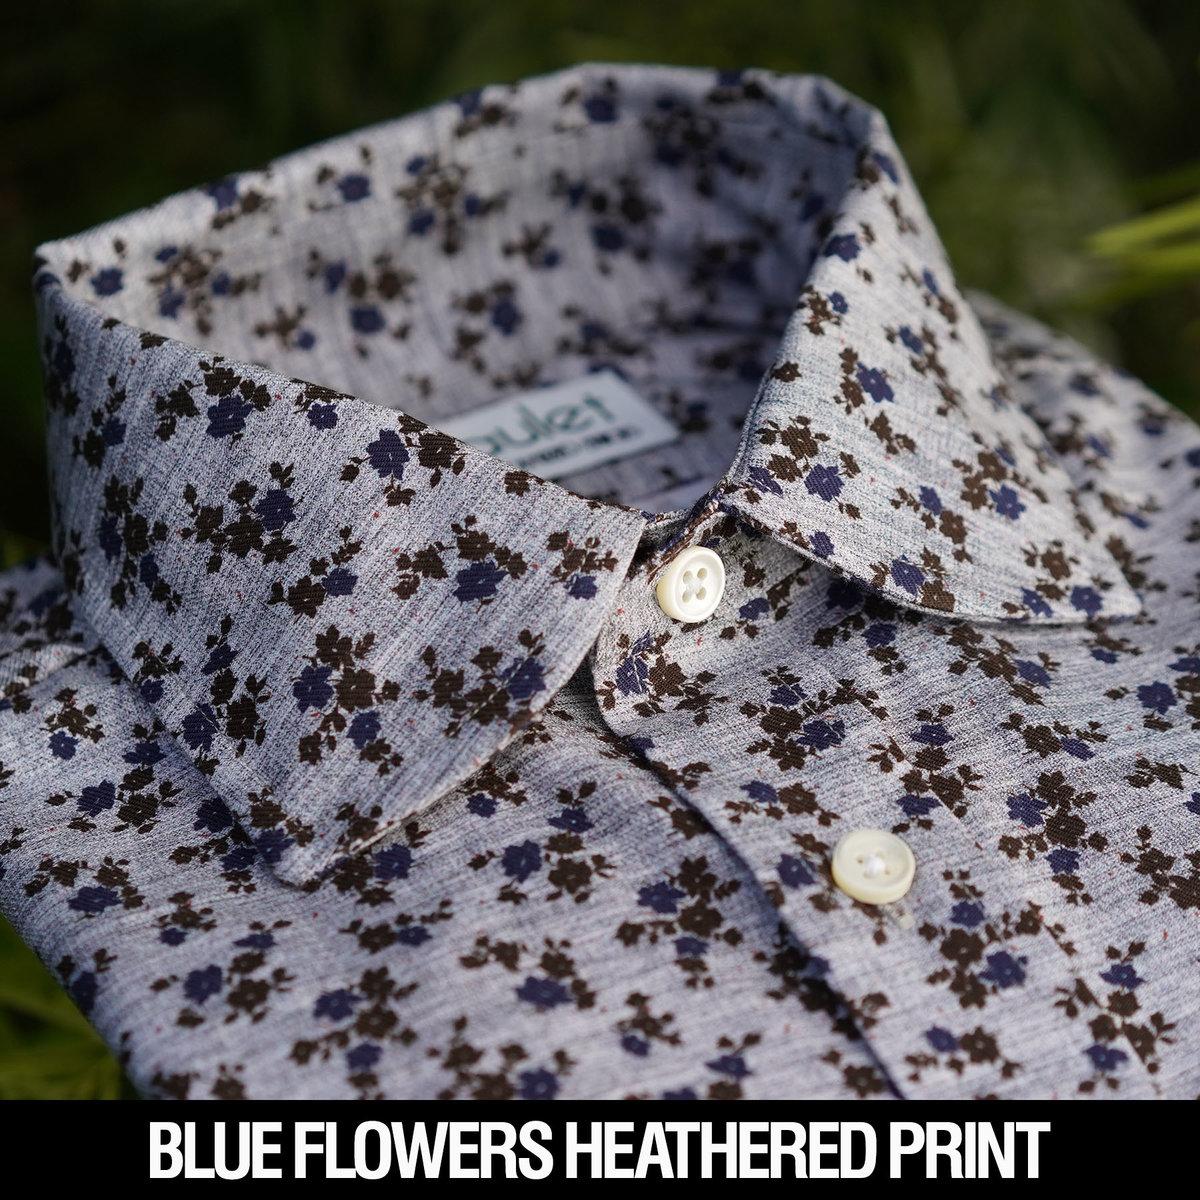 Blue Flowers Heathered Floral.jpg